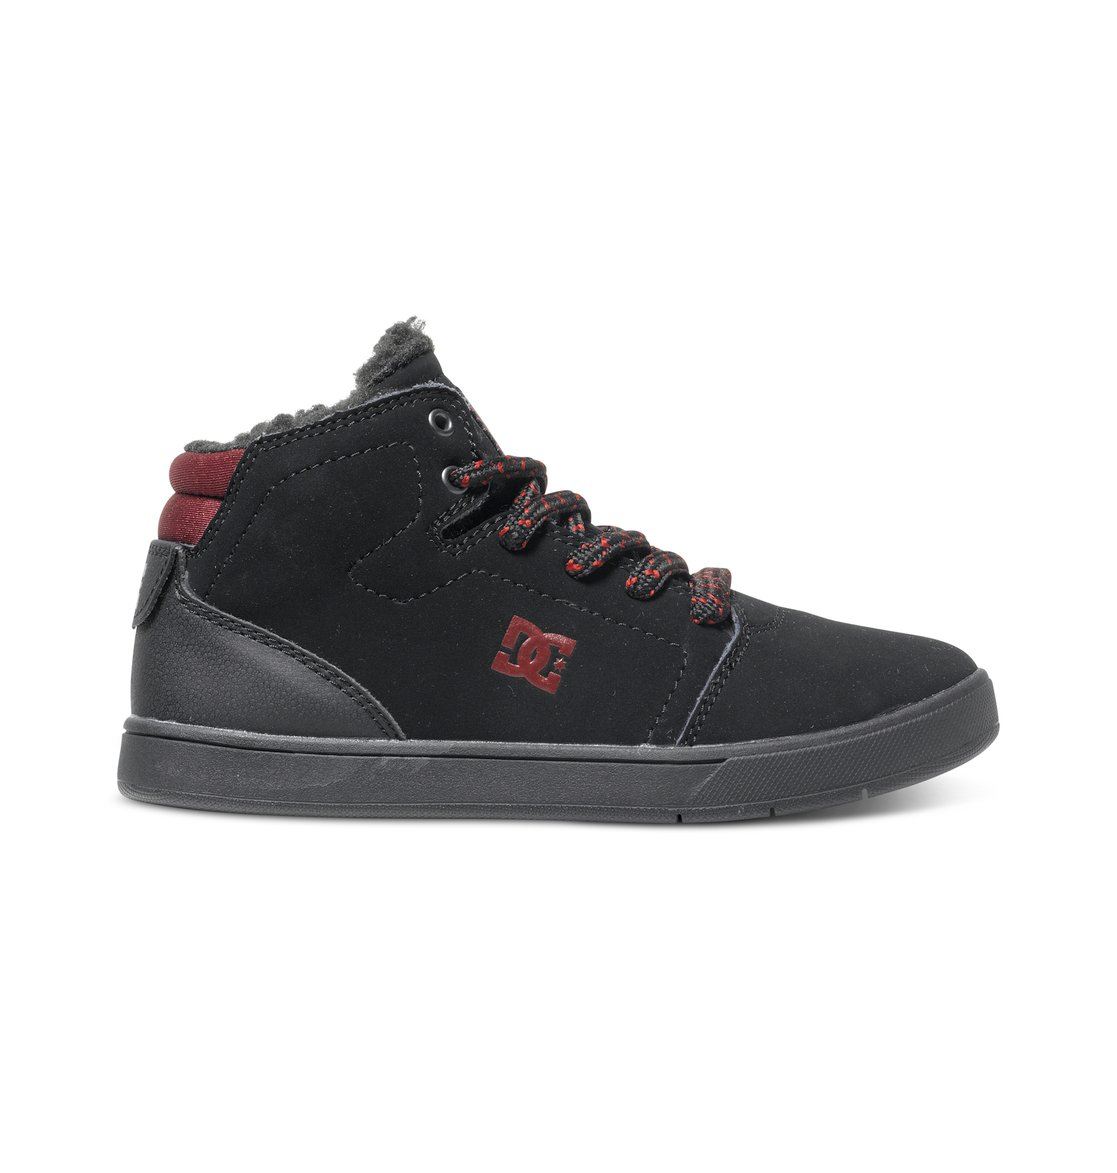 0 Zapatillas altas Crisis WNT - niño ADBS100116 DC Shoes 838c44756b3